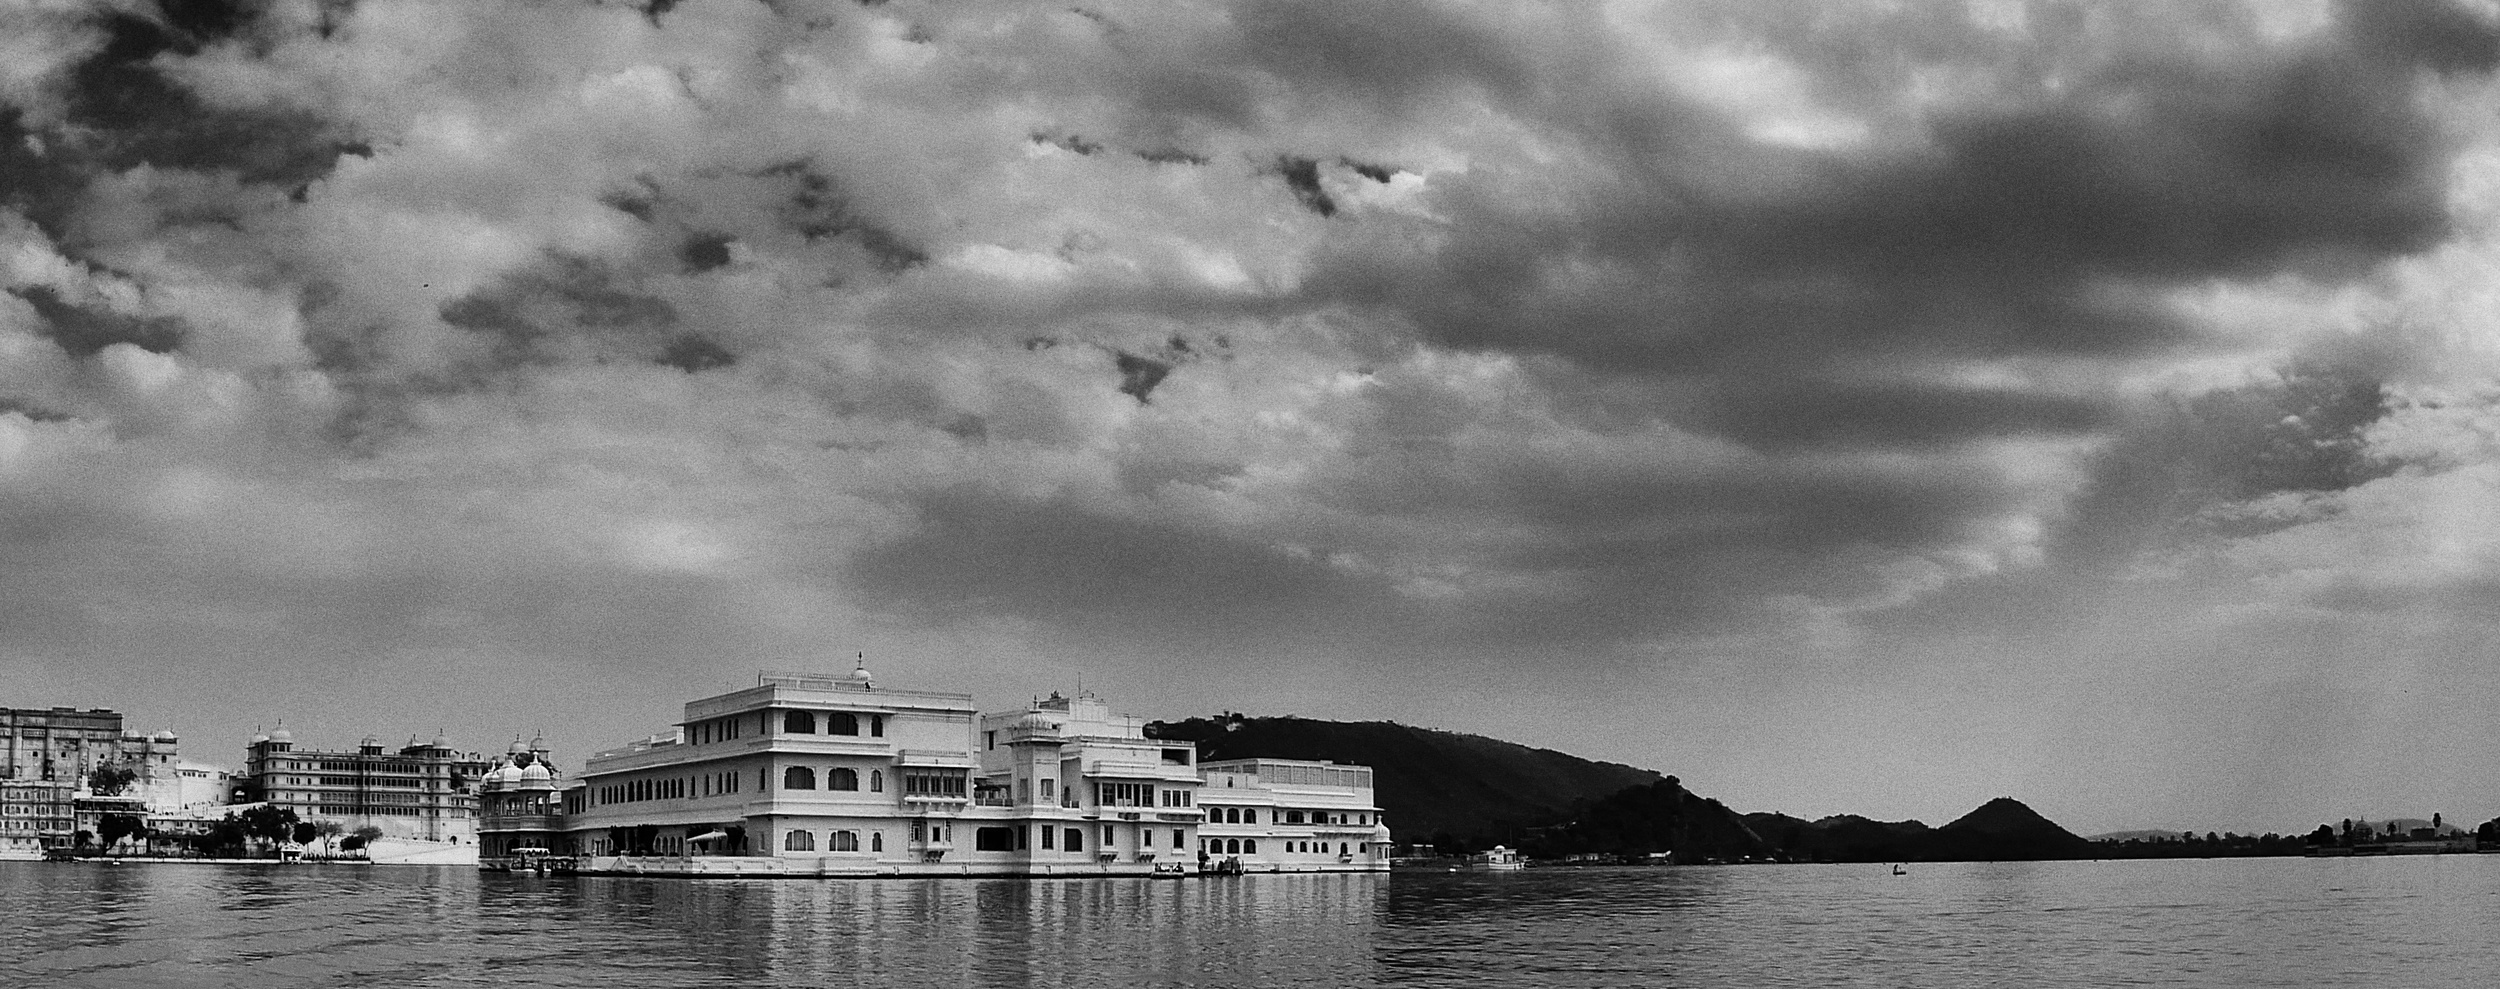 Lakepal8.jpg